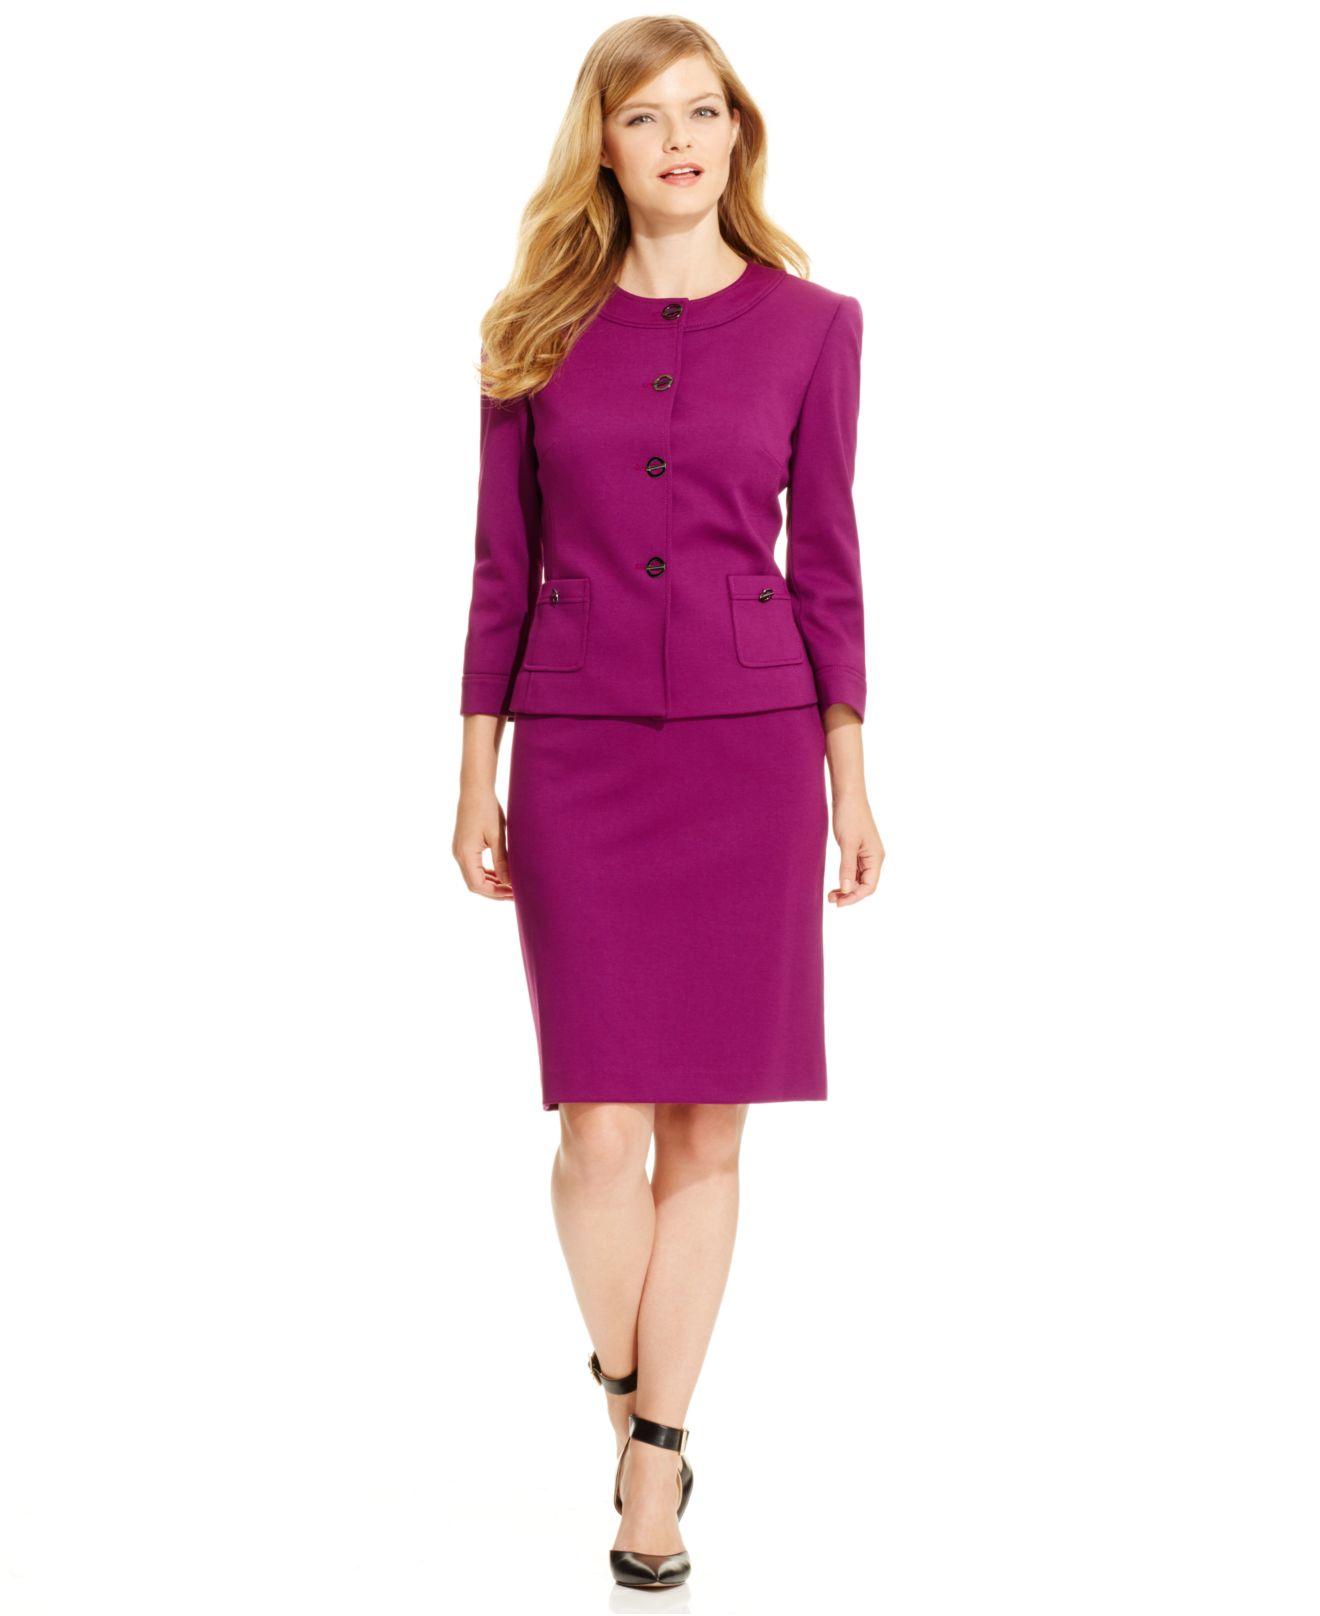 c69c102aa2c7 Tahari Petite Ponte Turn-key Skirt Suit in Purple - Lyst